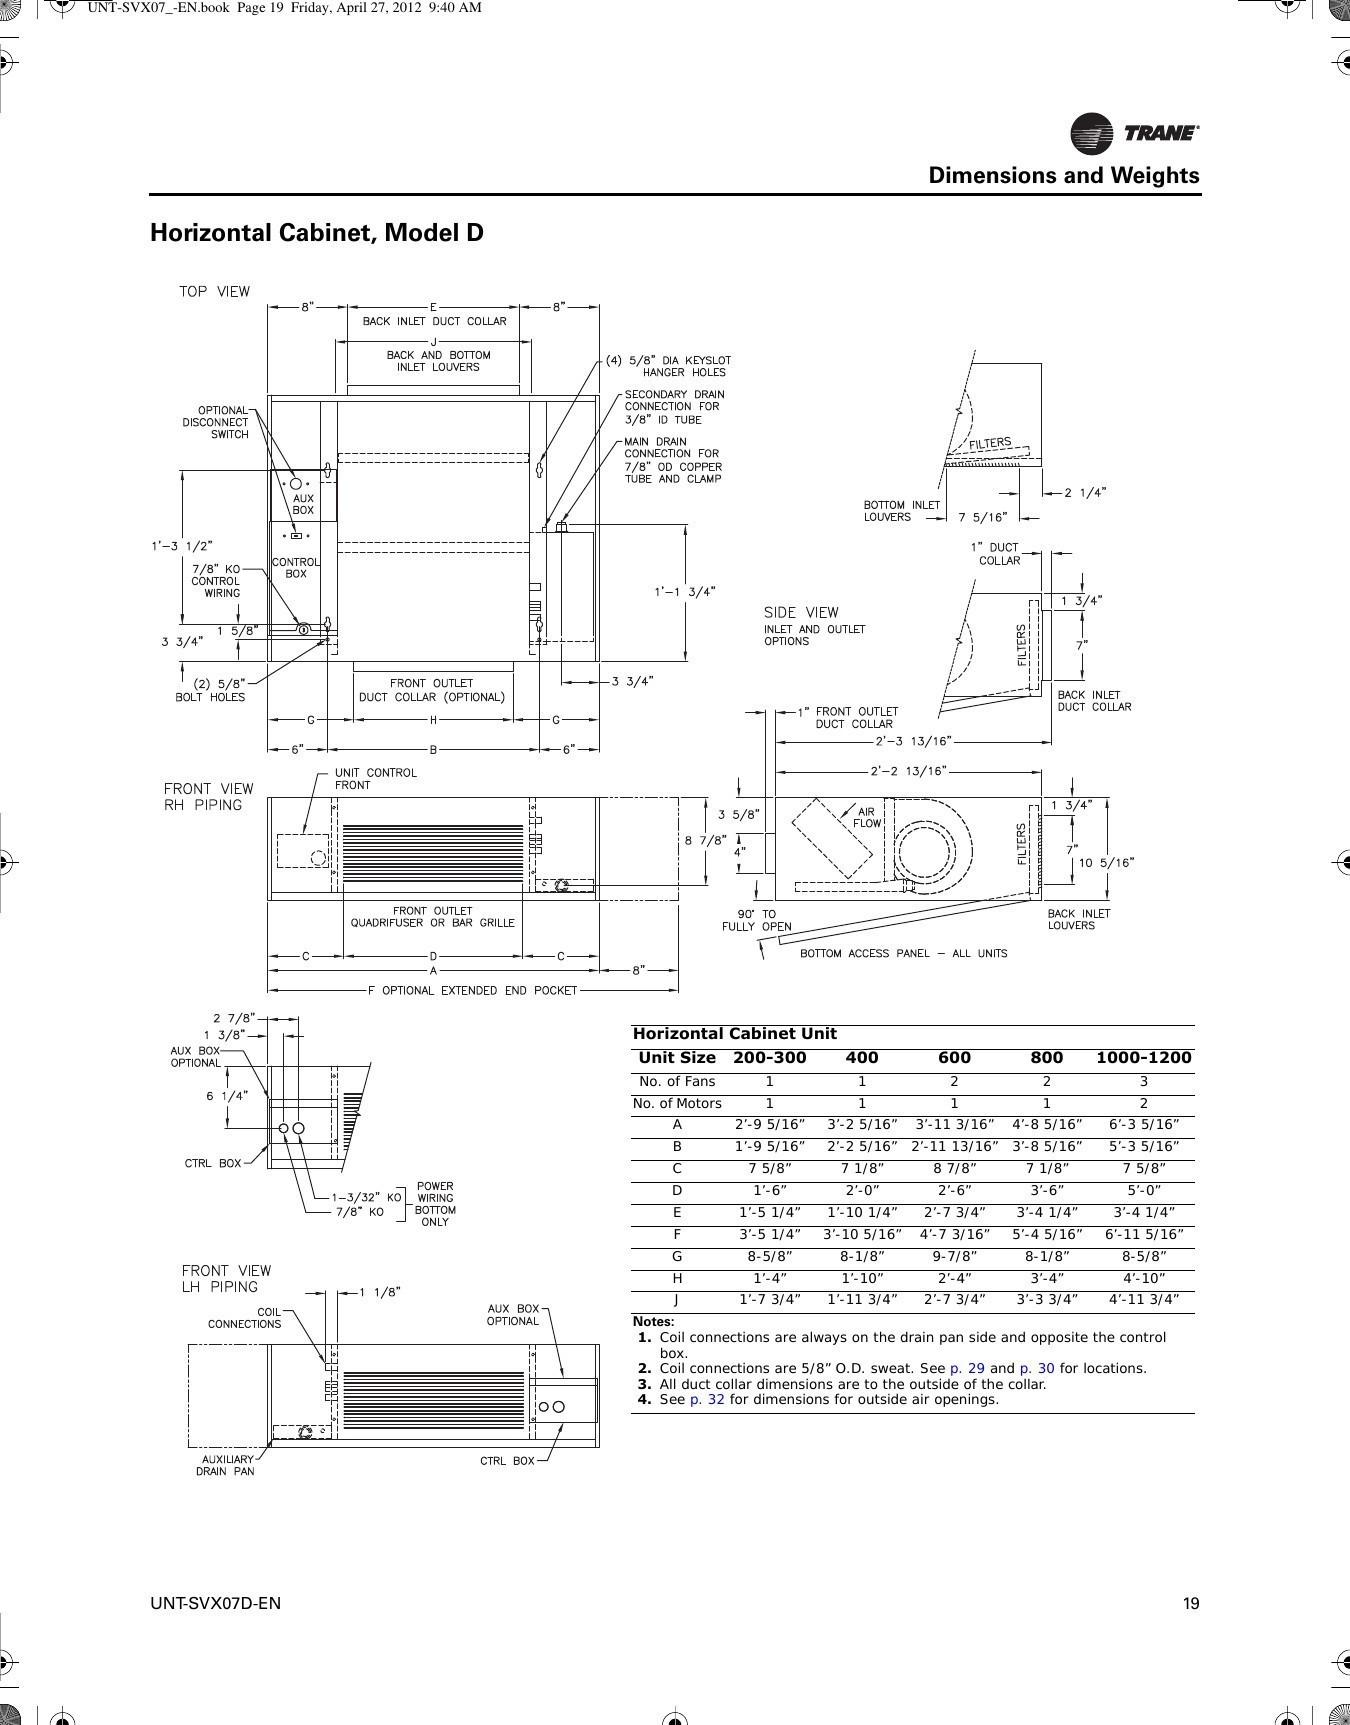 2002 Gmc sonoma Engine Diagram Heater Wiring Diagram 1997 Gmc Jimmy Electrical Wiring Diagrams Of 2002 Gmc sonoma Engine Diagram